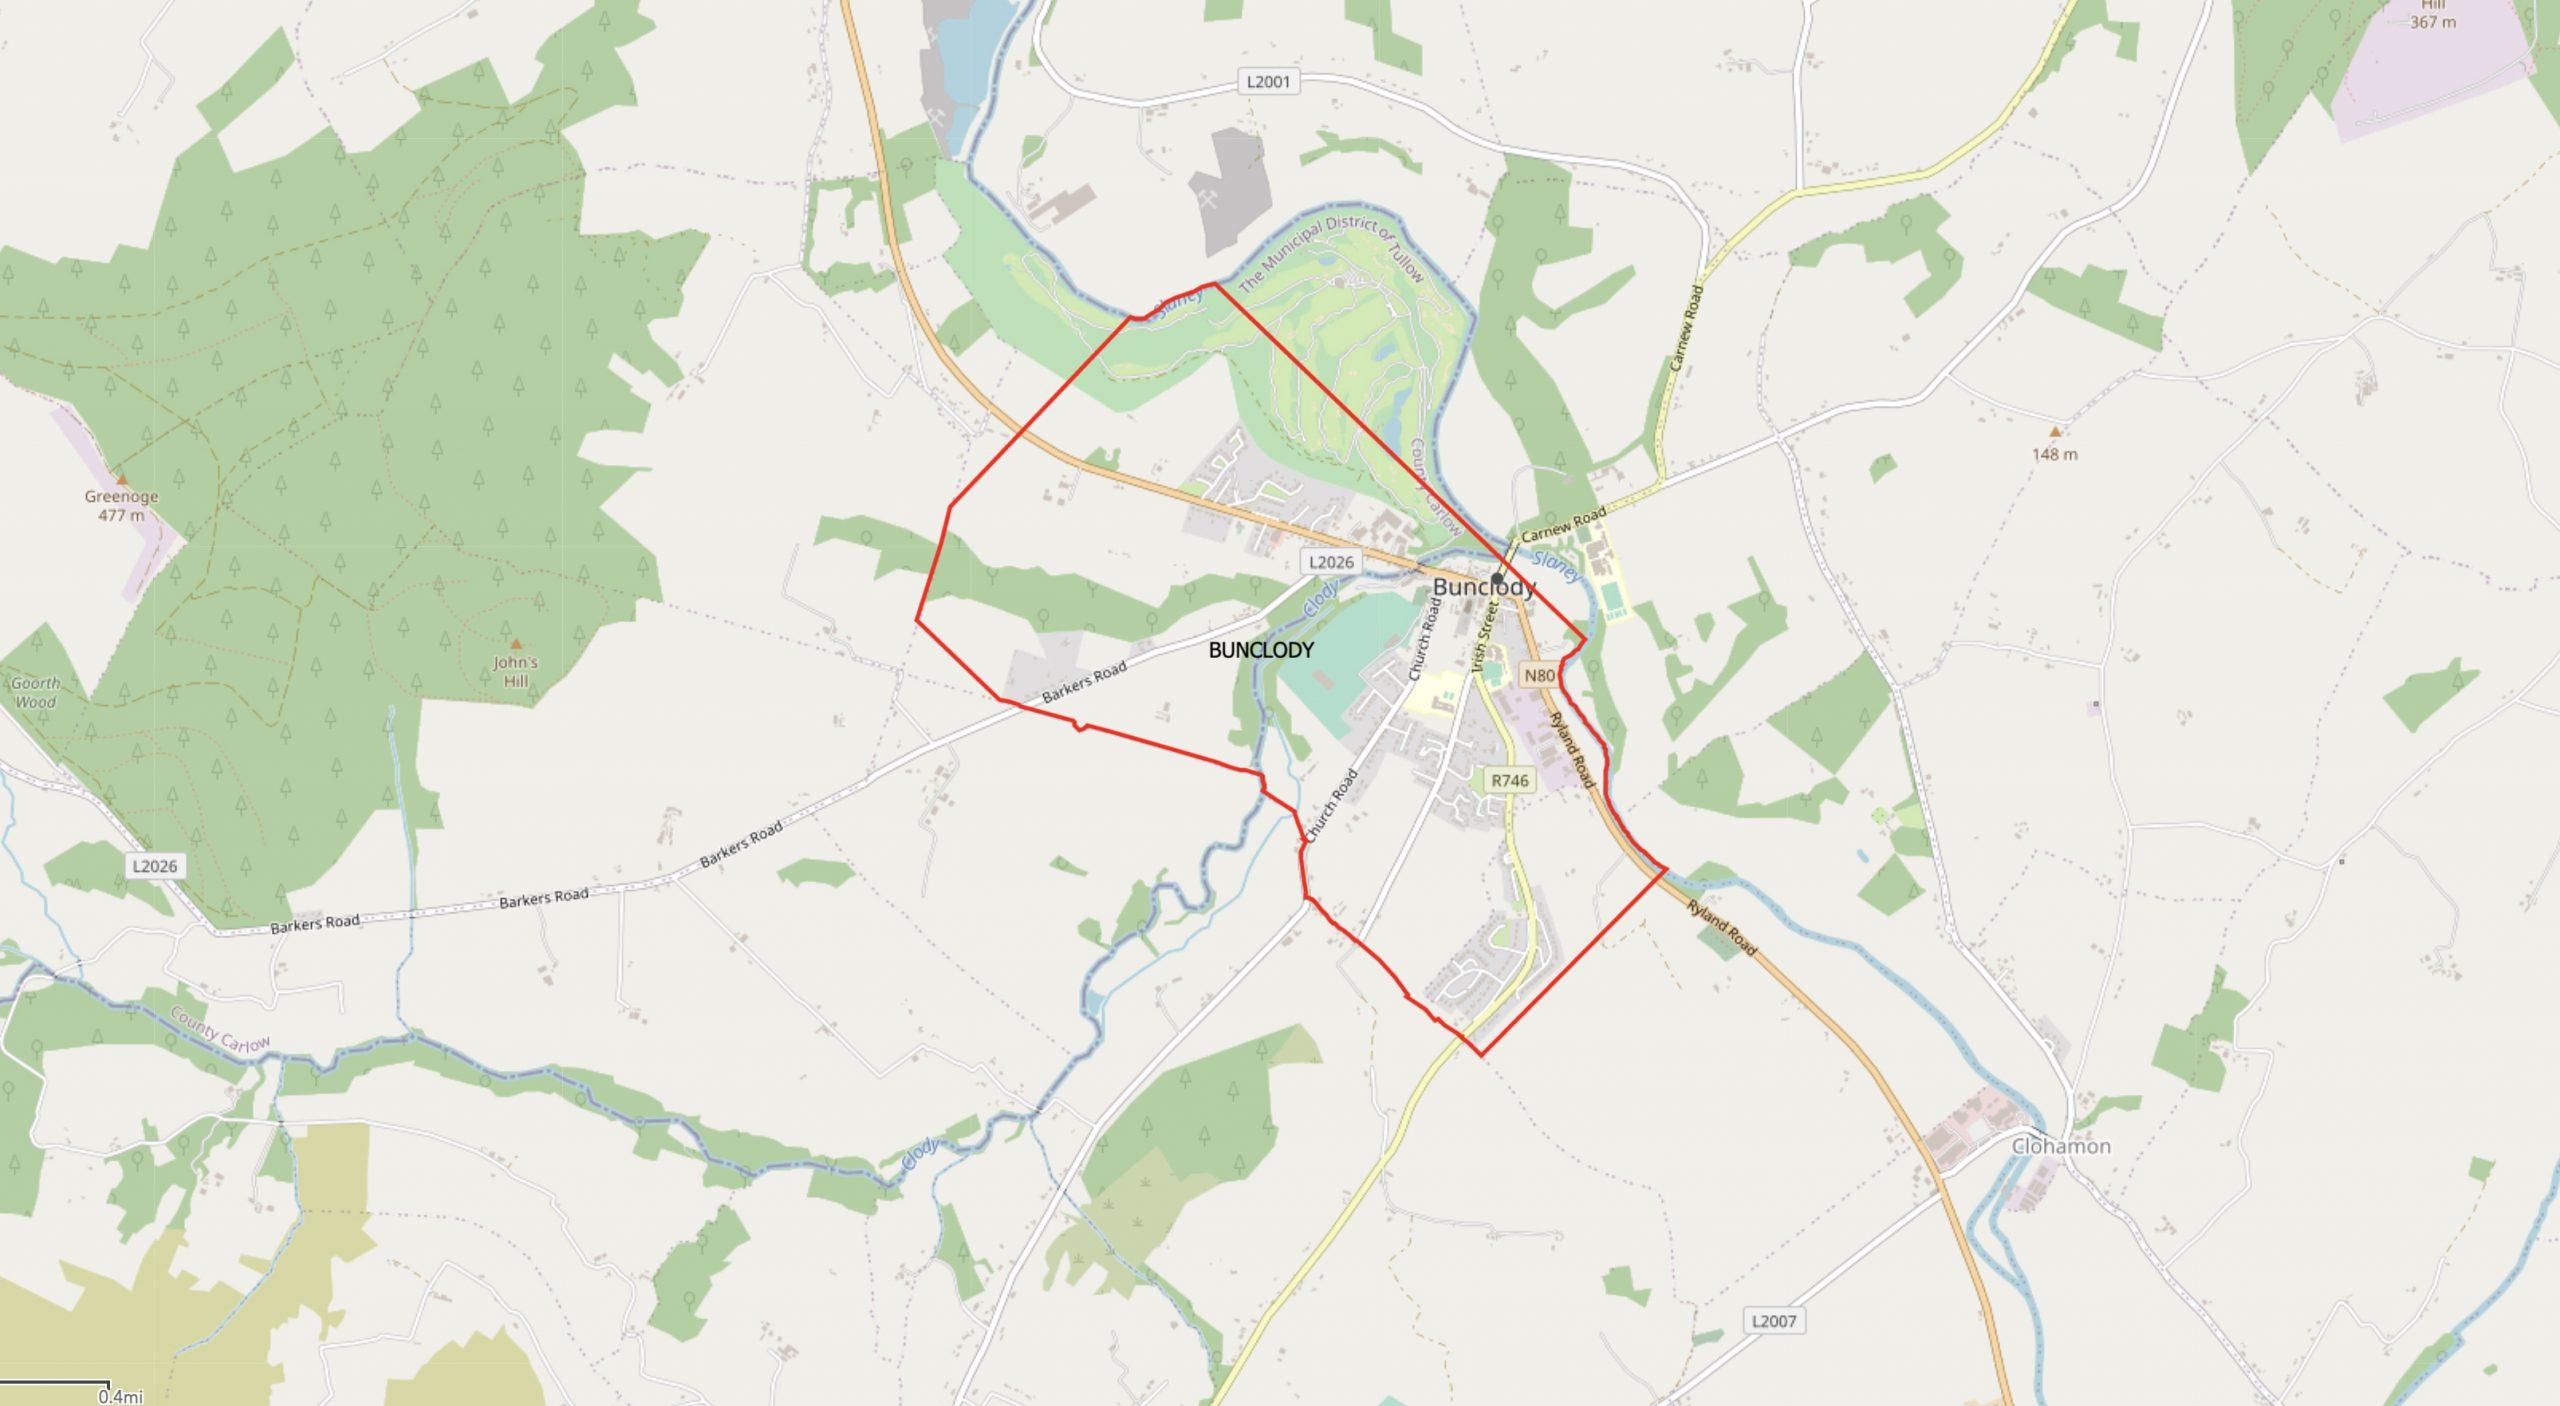 solar-panels-bunclody-wexford-ireland-map-img